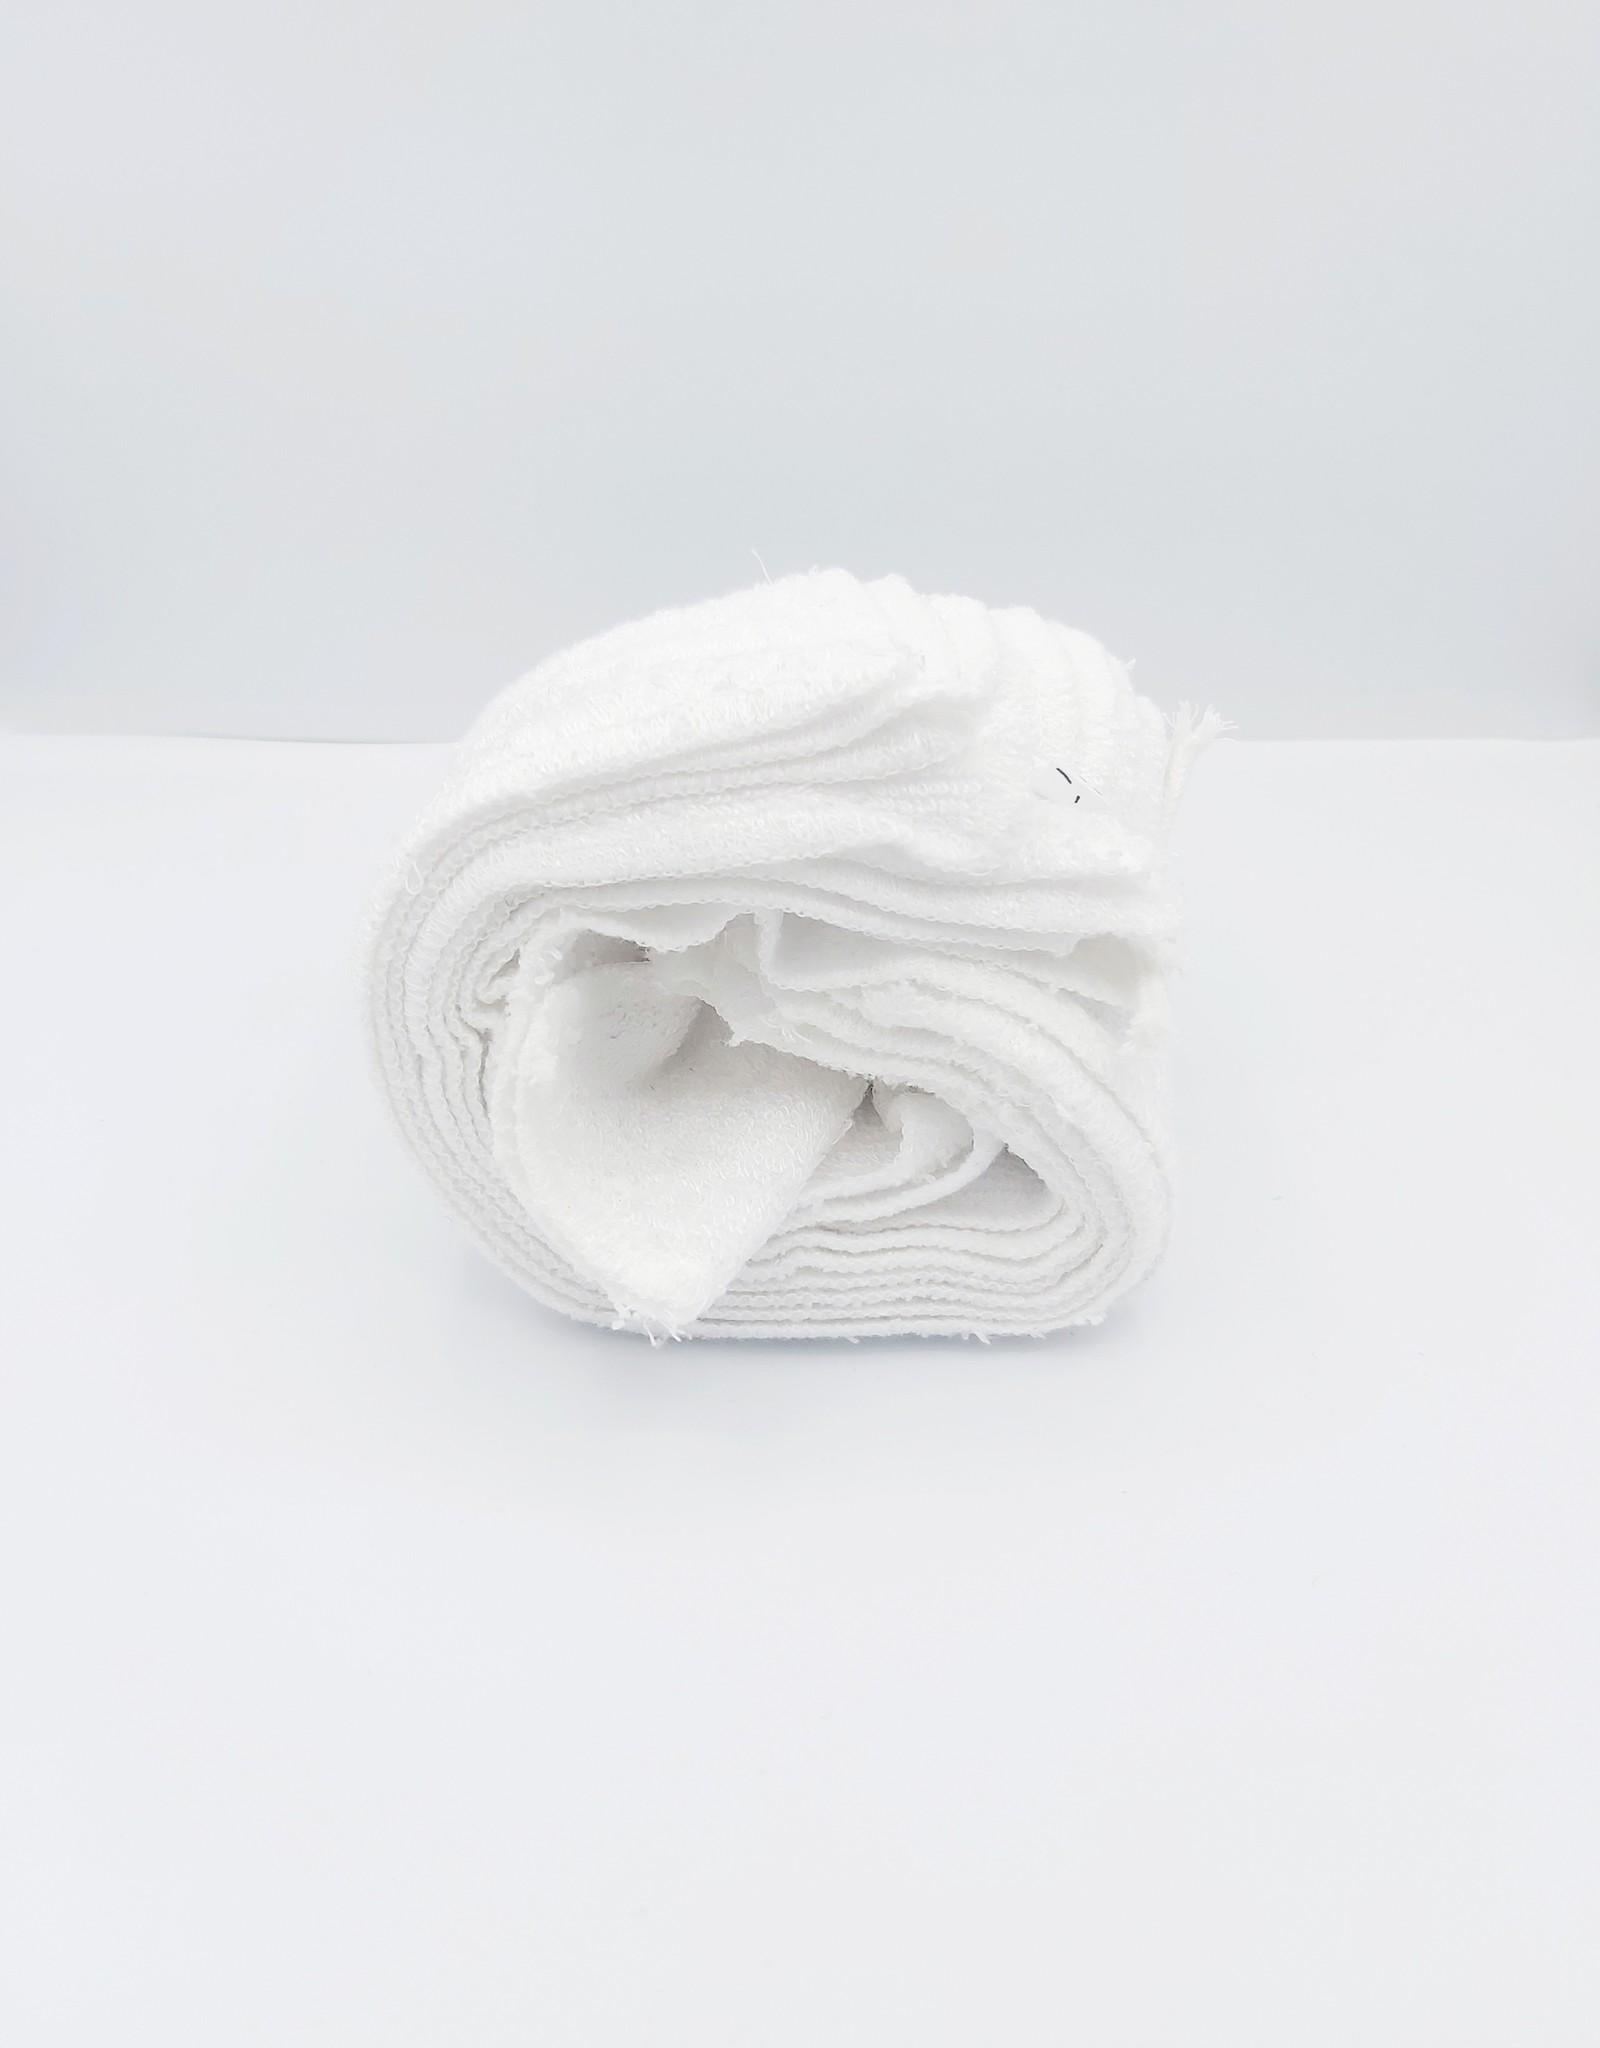 Tabitha Eve Herbruikbare toilet doekjes